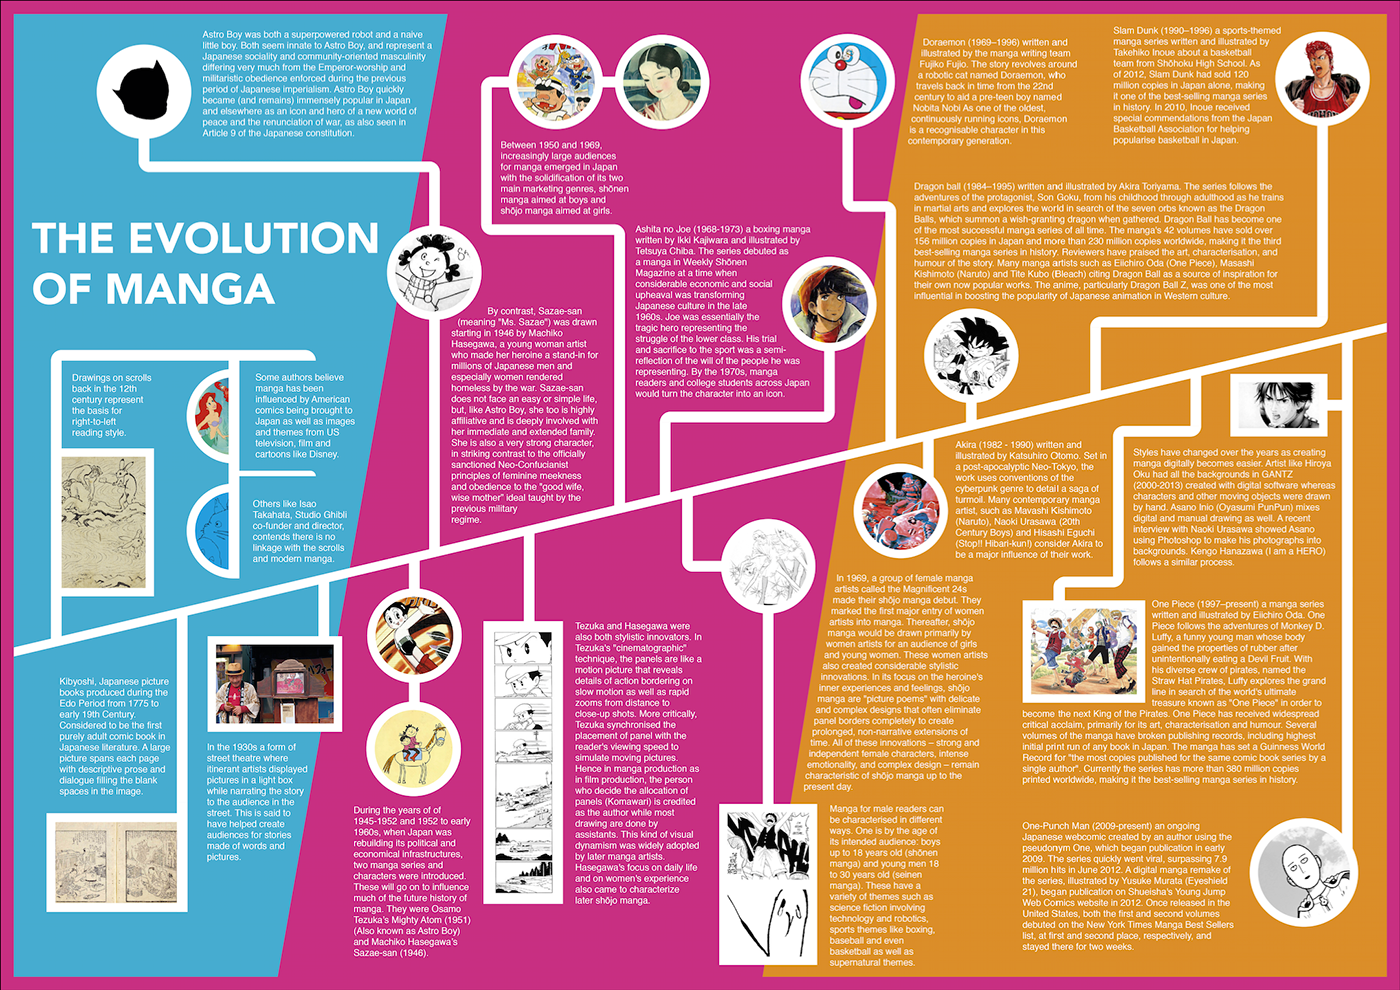 The Evolution Of Manga Infographic Infographic Educational Infographic Social Media Infographic